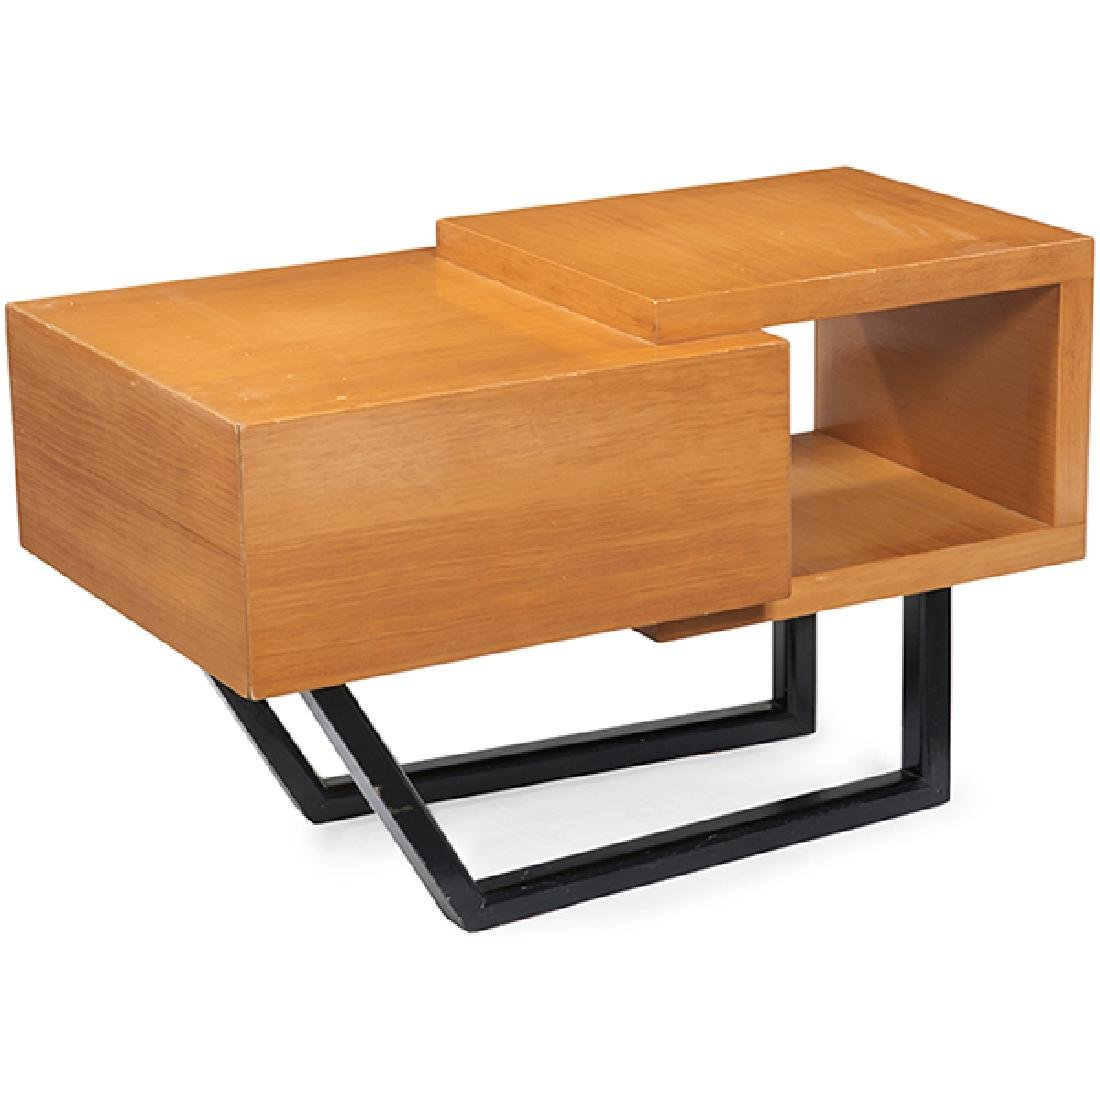 "Mid-century Modern end table 20""w x 34""d x 21.75""h"